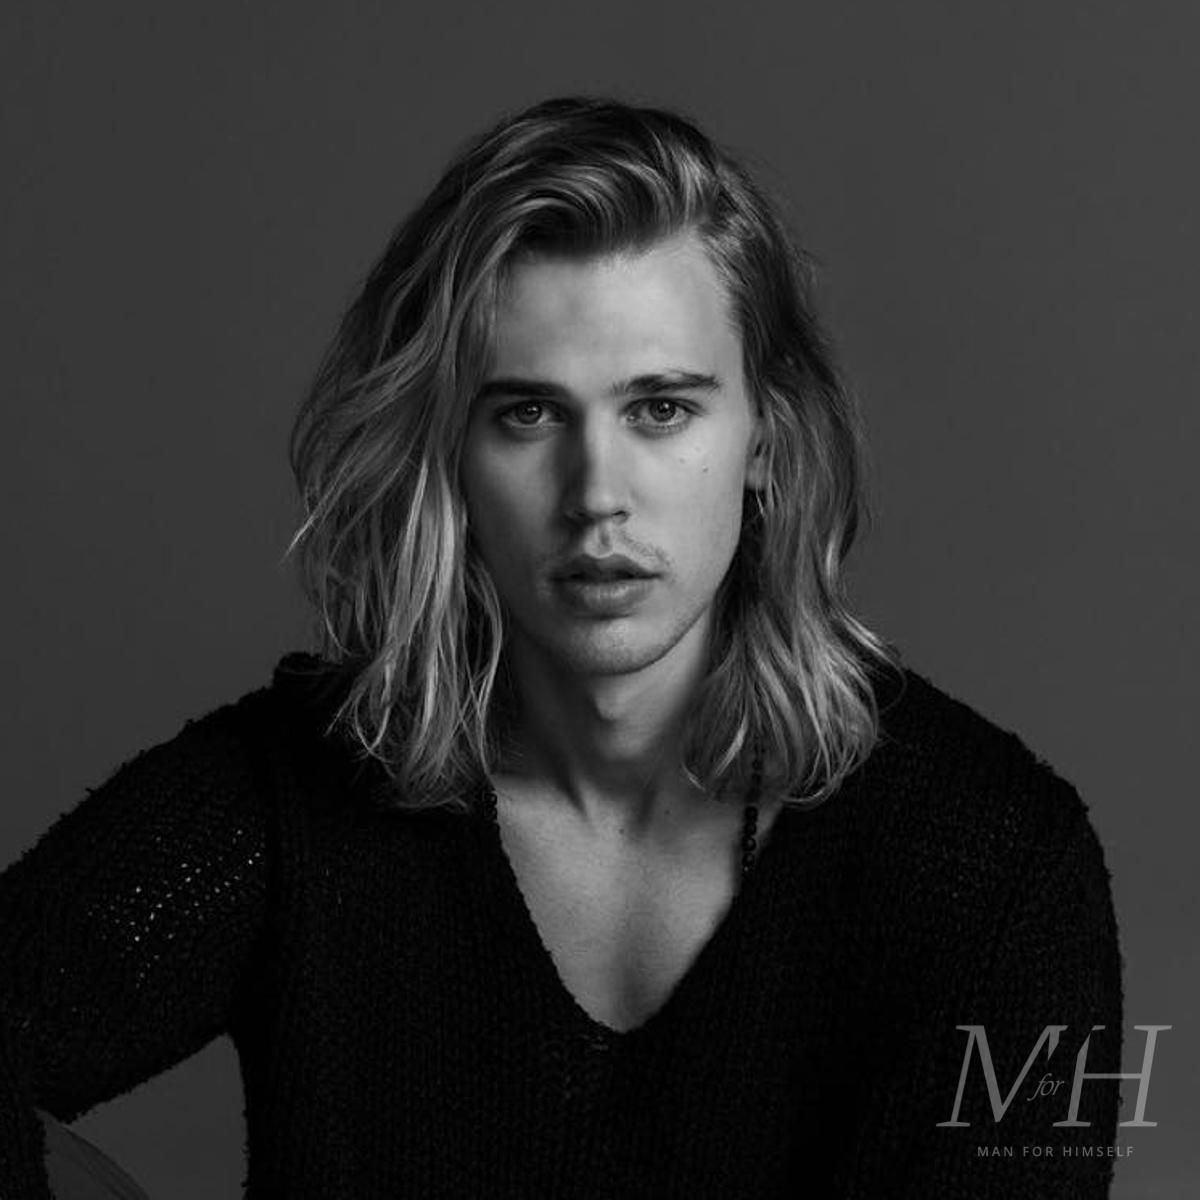 austin-butler-hair-celebrity-hairstyle-long-MFHC25-man-for-himself-2